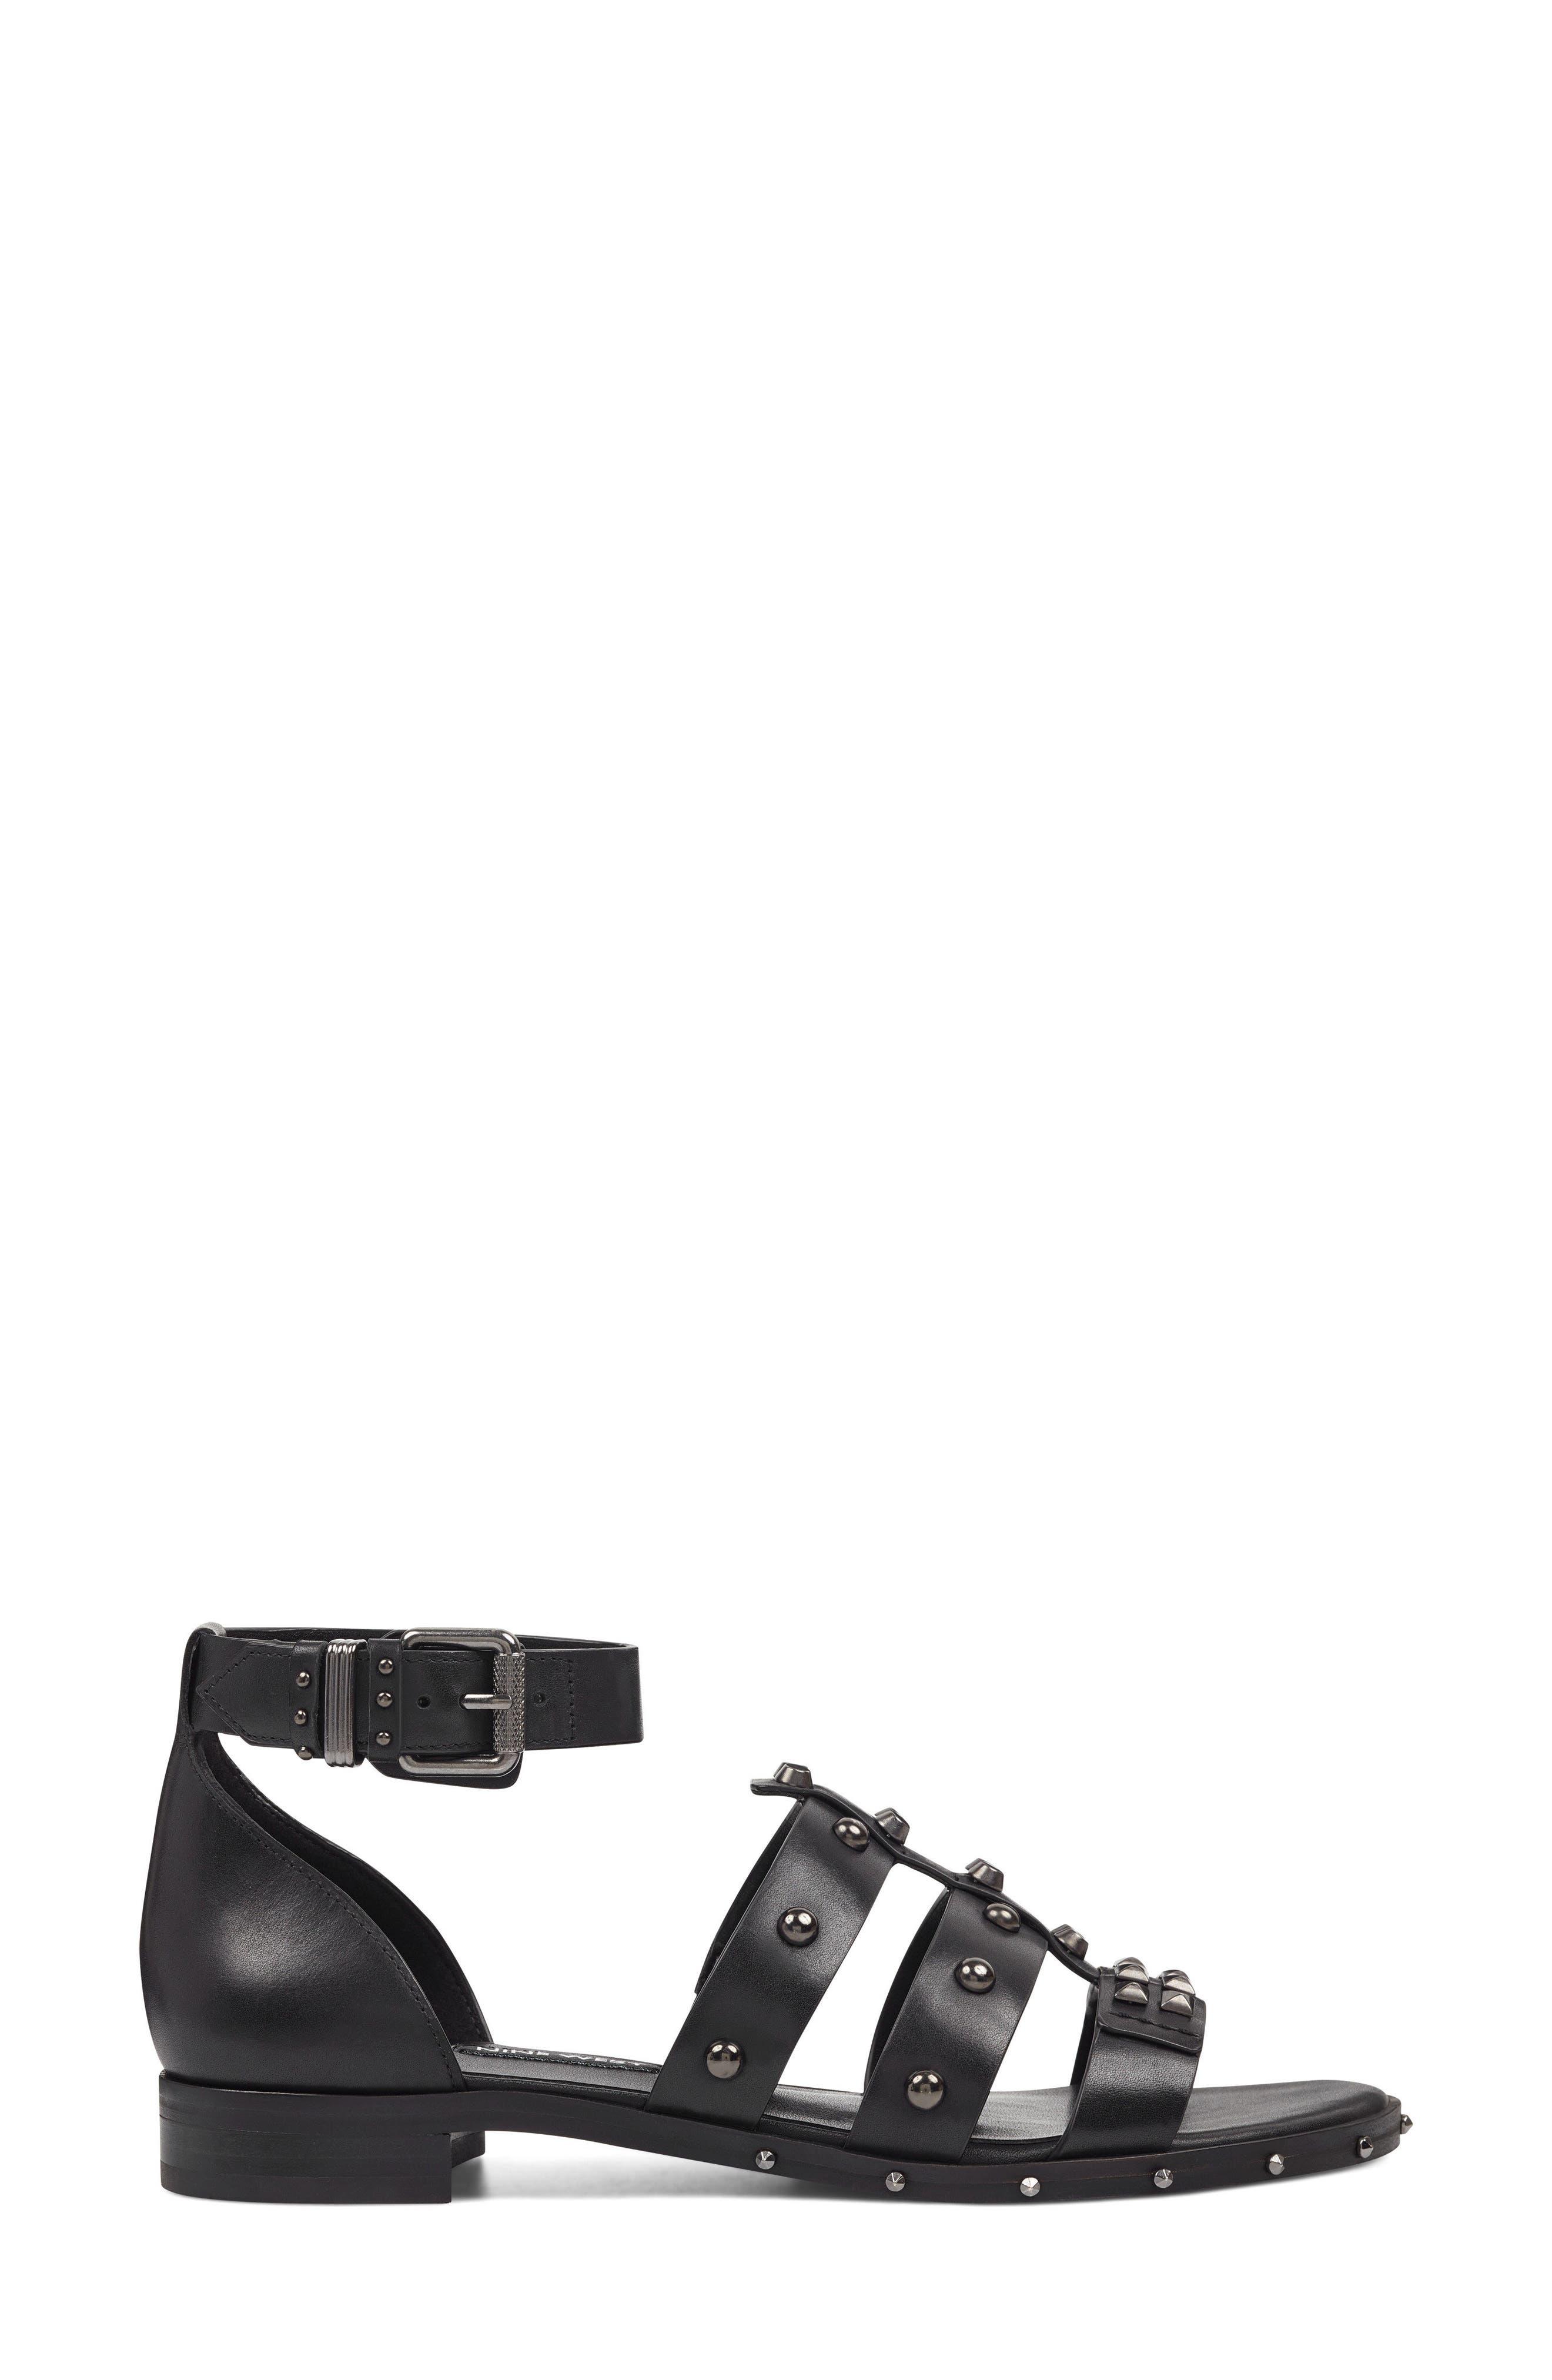 Corisande Sandal,                             Alternate thumbnail 3, color,                             BLACK LEATHER